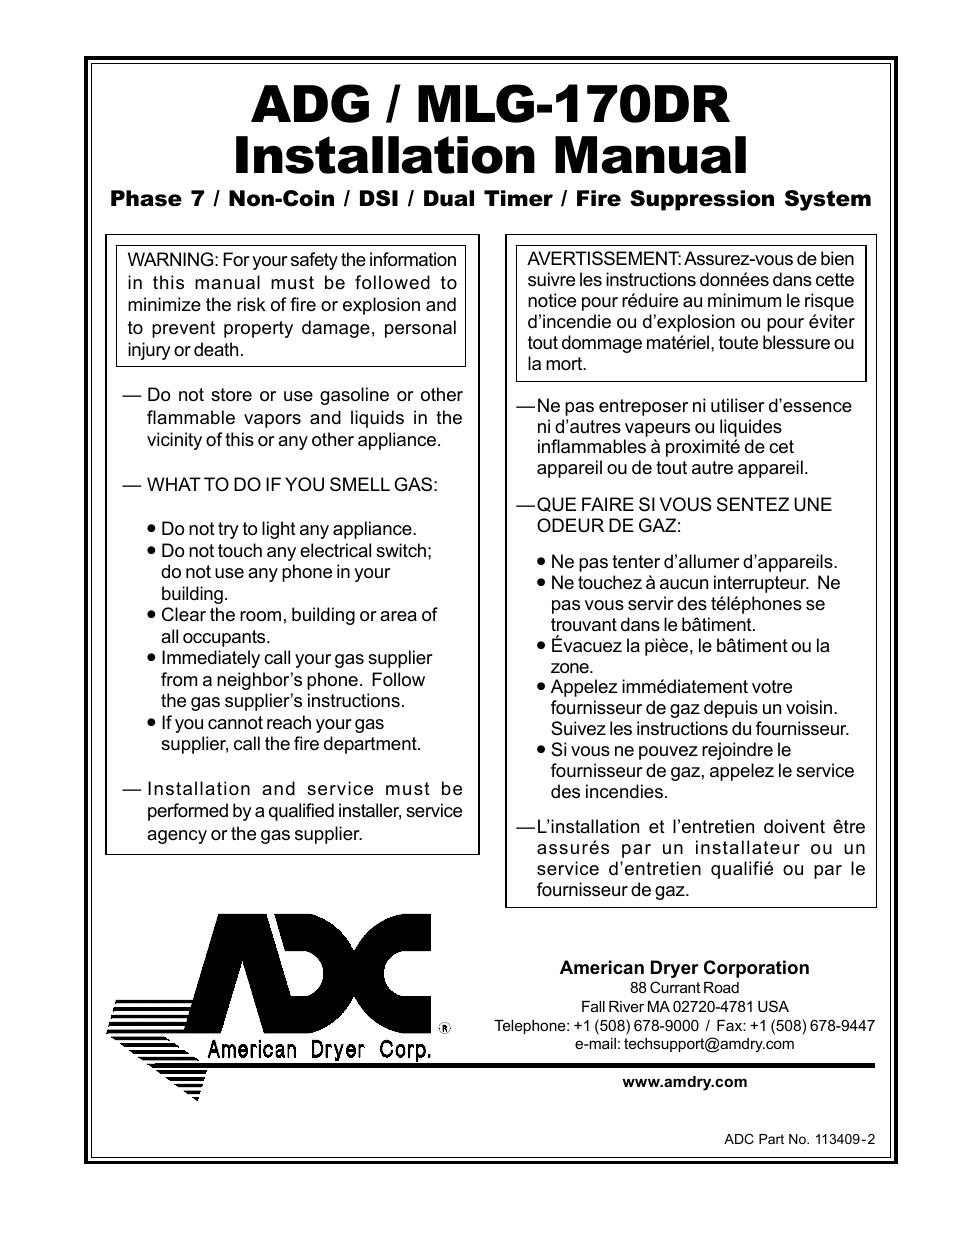 american dryer corp adg mlg 170dr user manual 40 pages rh manualsdir com Spongebob MLG MLG Doge